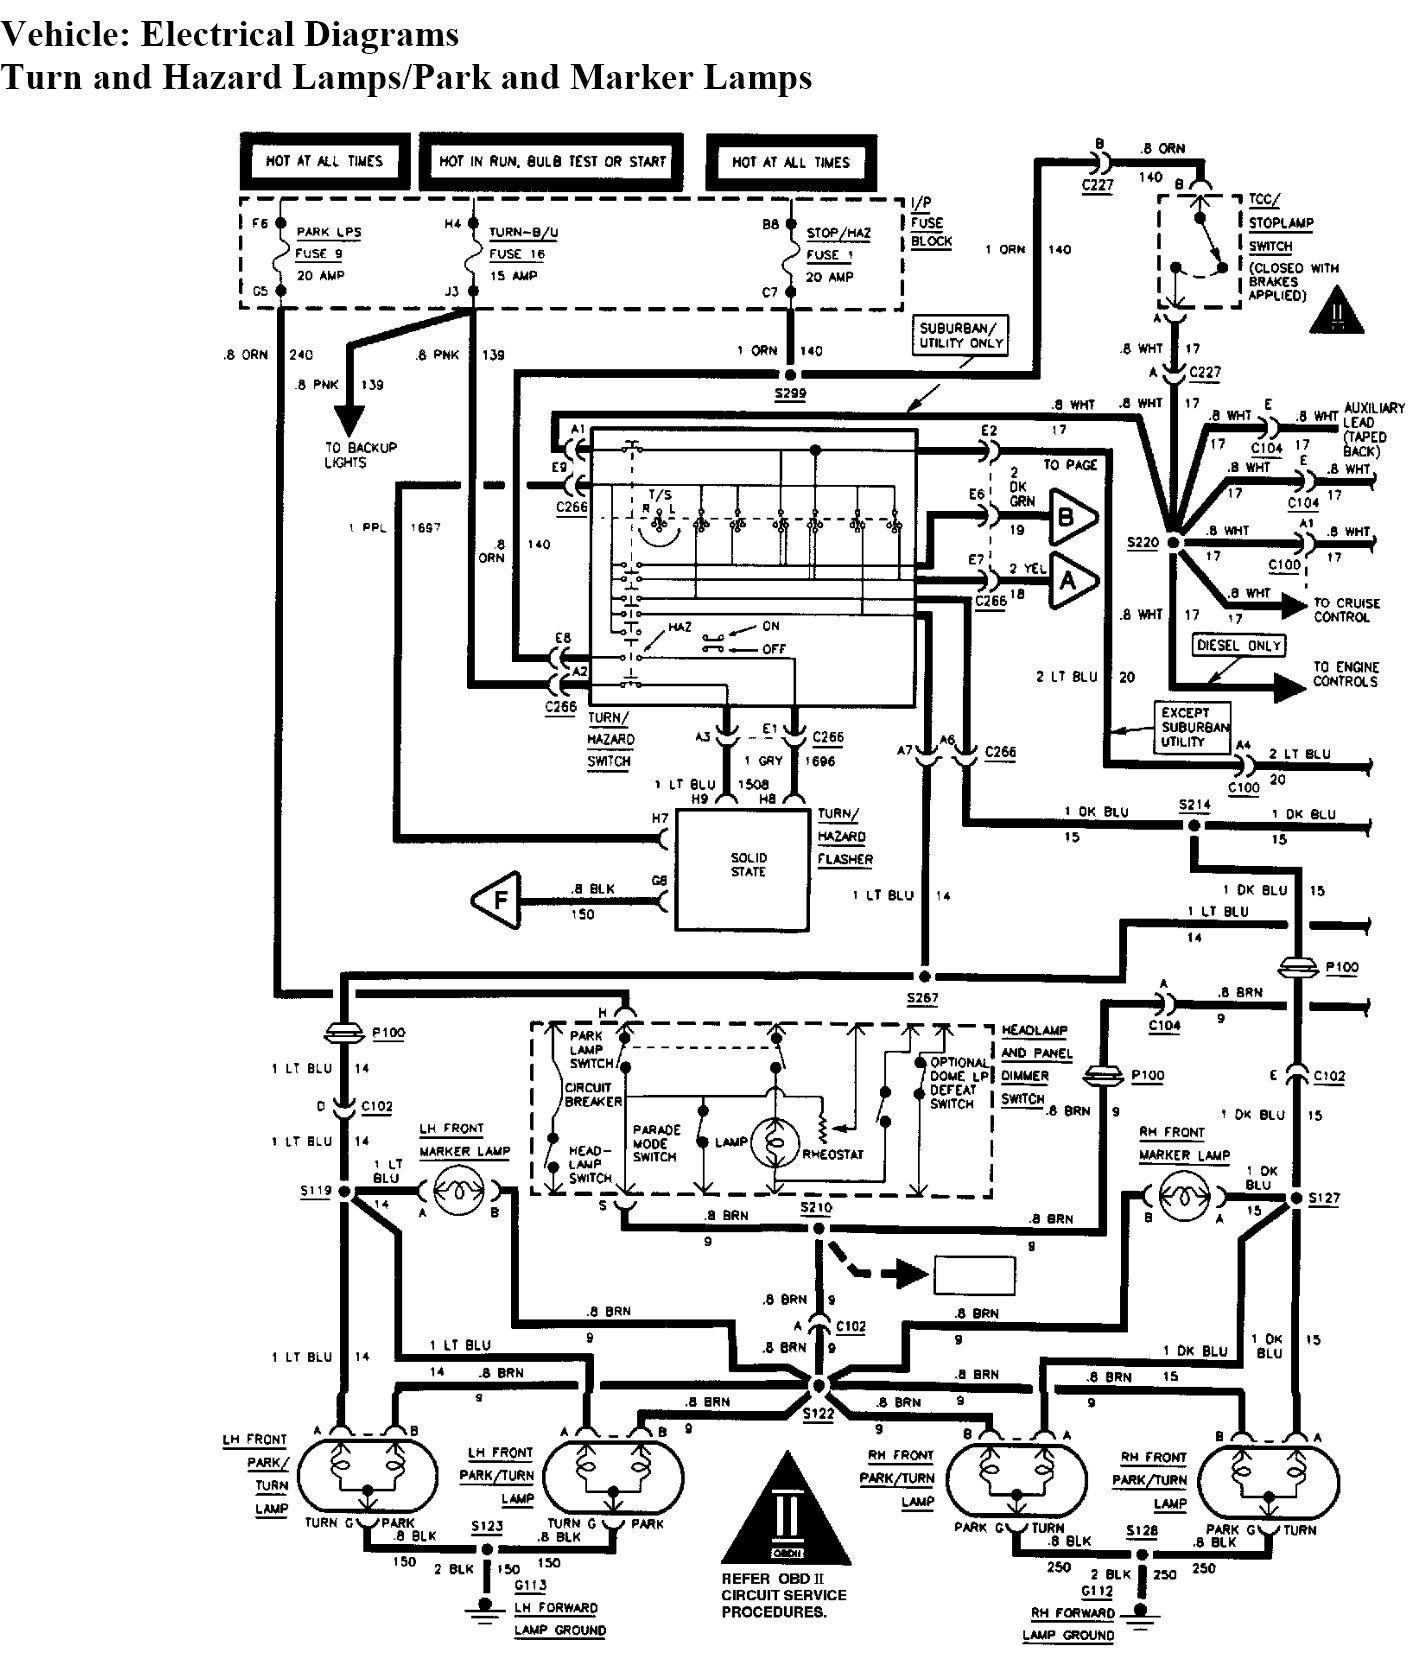 Chevy Brake Light Switch Wiring Diagram | Wiring Library - Brake Light Switch Wiring Diagram